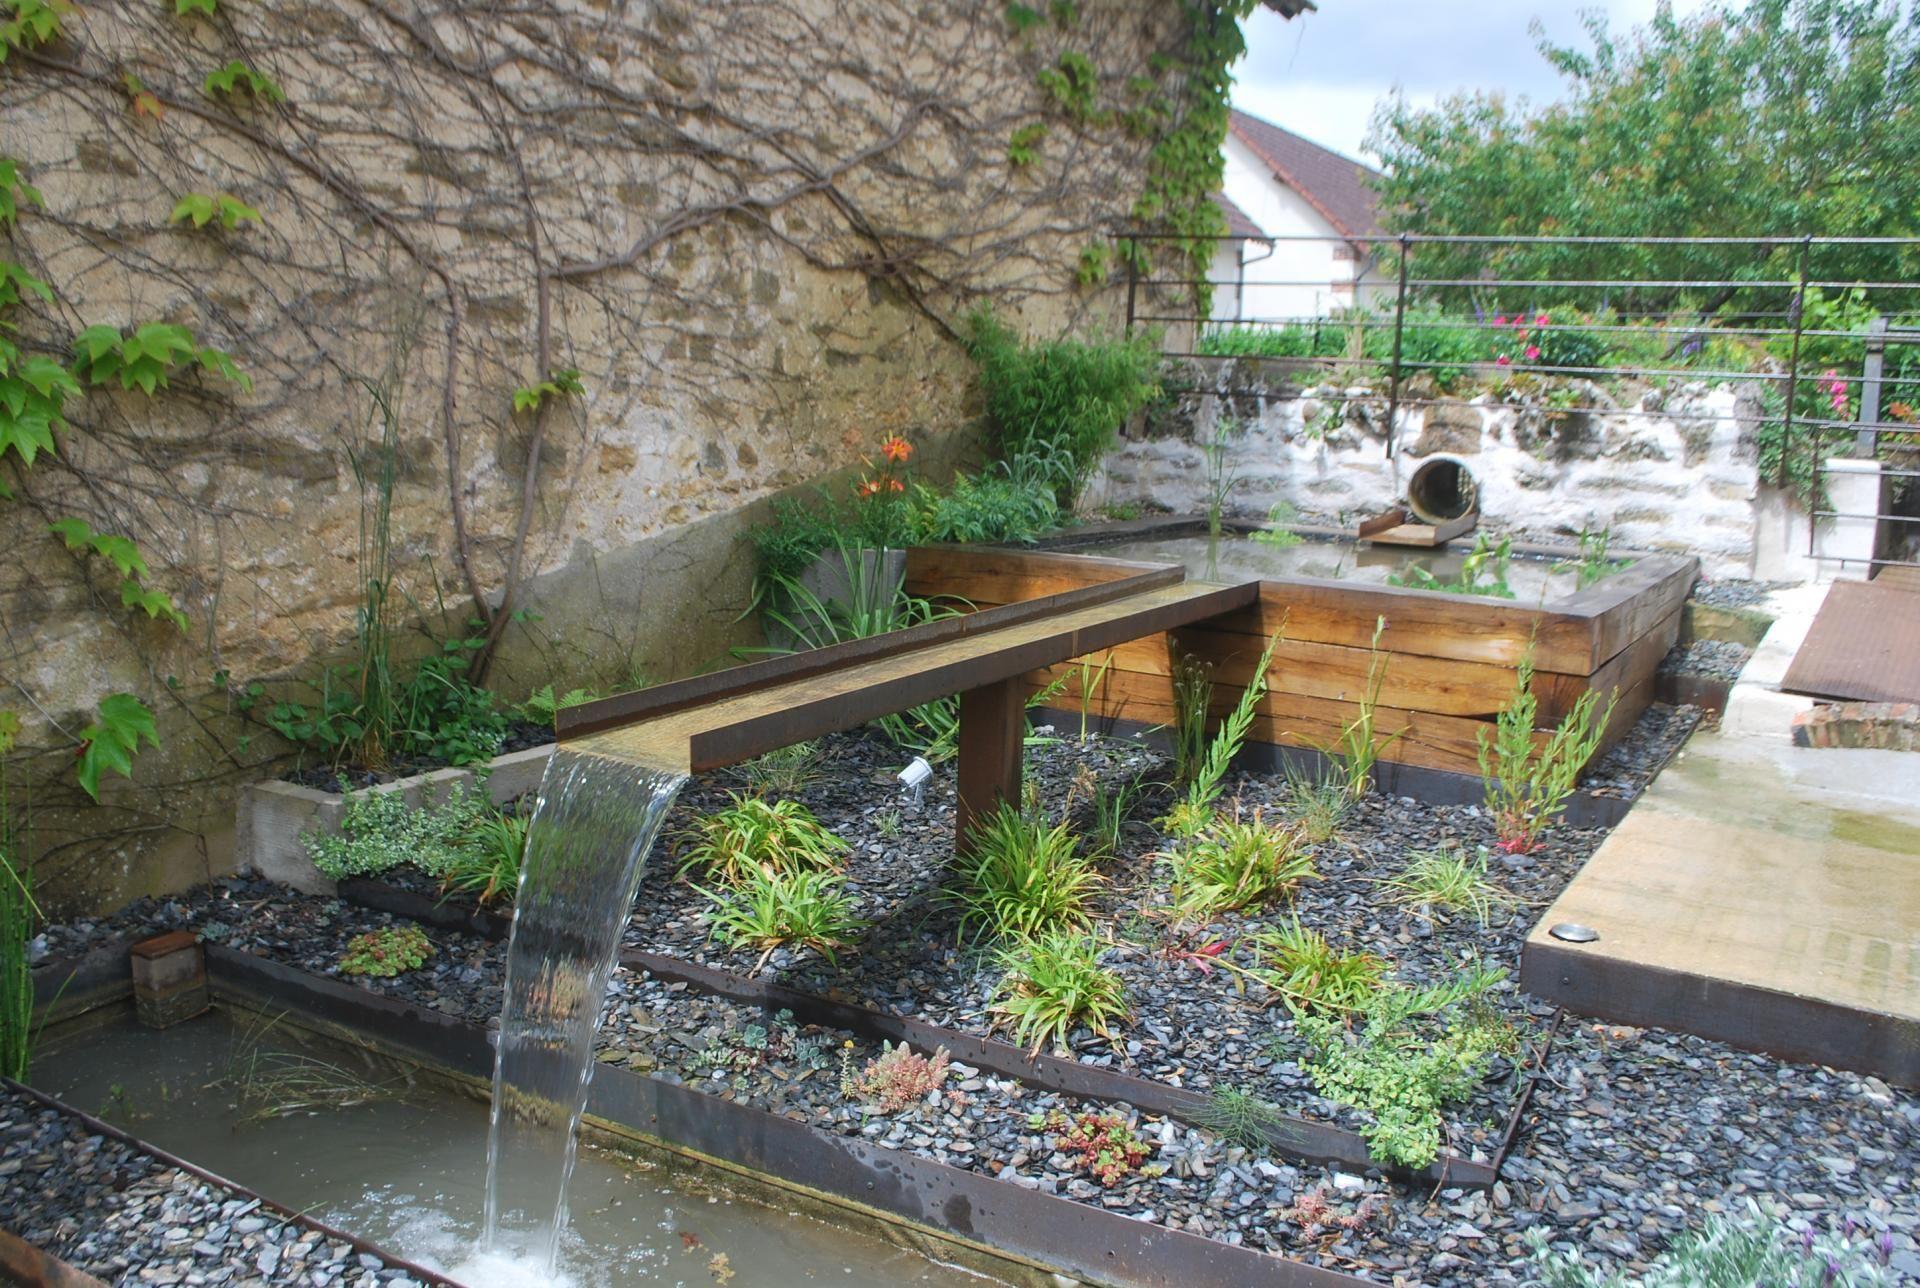 Idee Cascade Pour Bassin Finest La Filtration With Idee Cascade